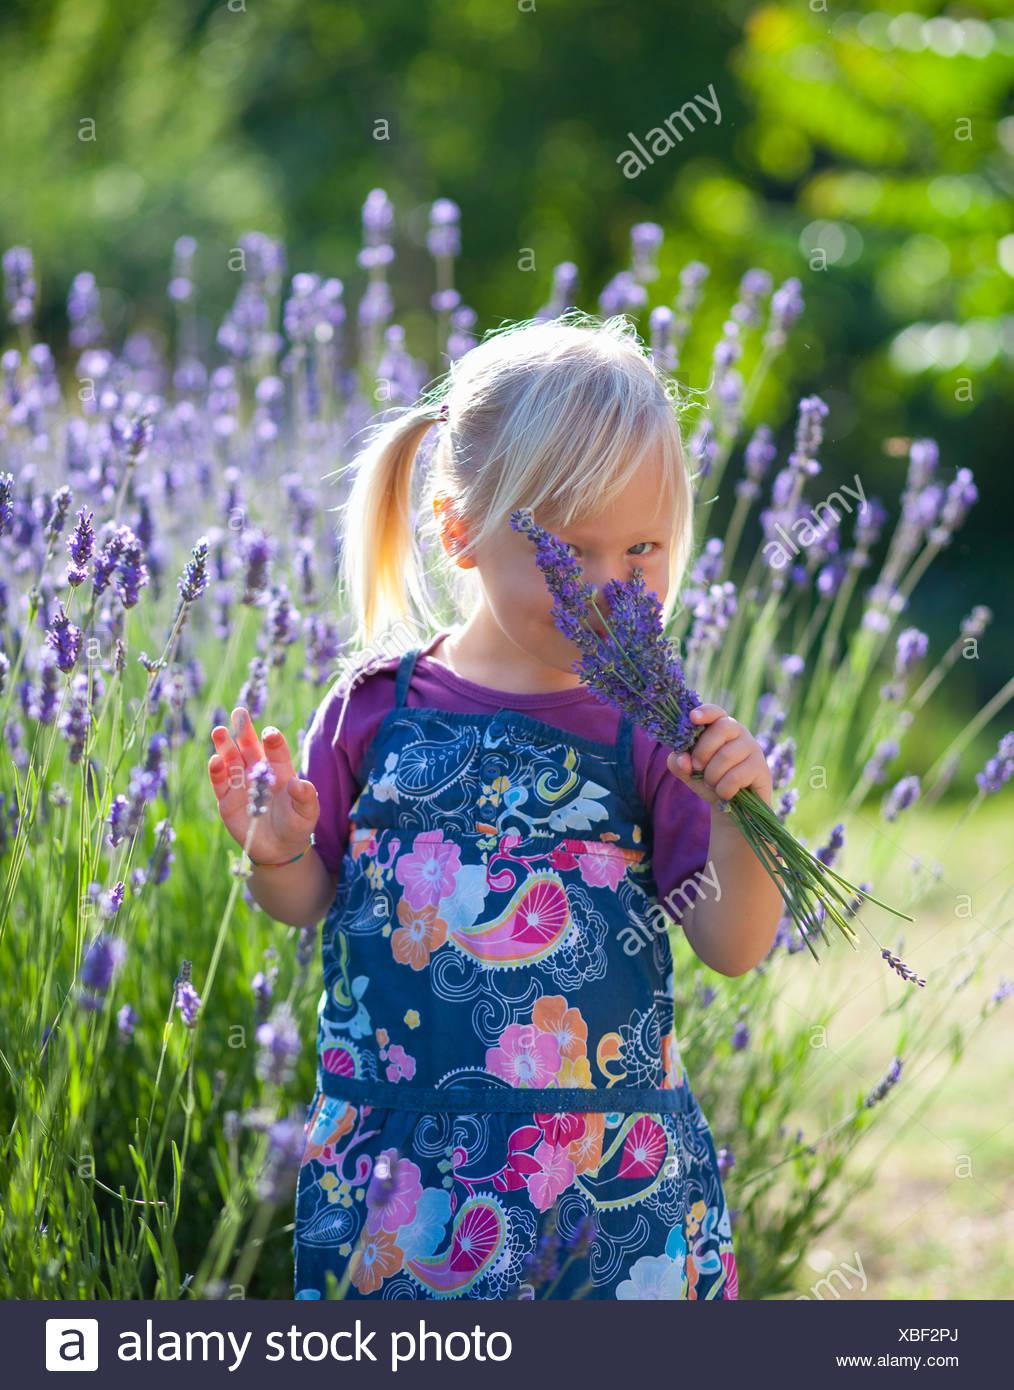 Girl smelling lavender flowers - Stock Image